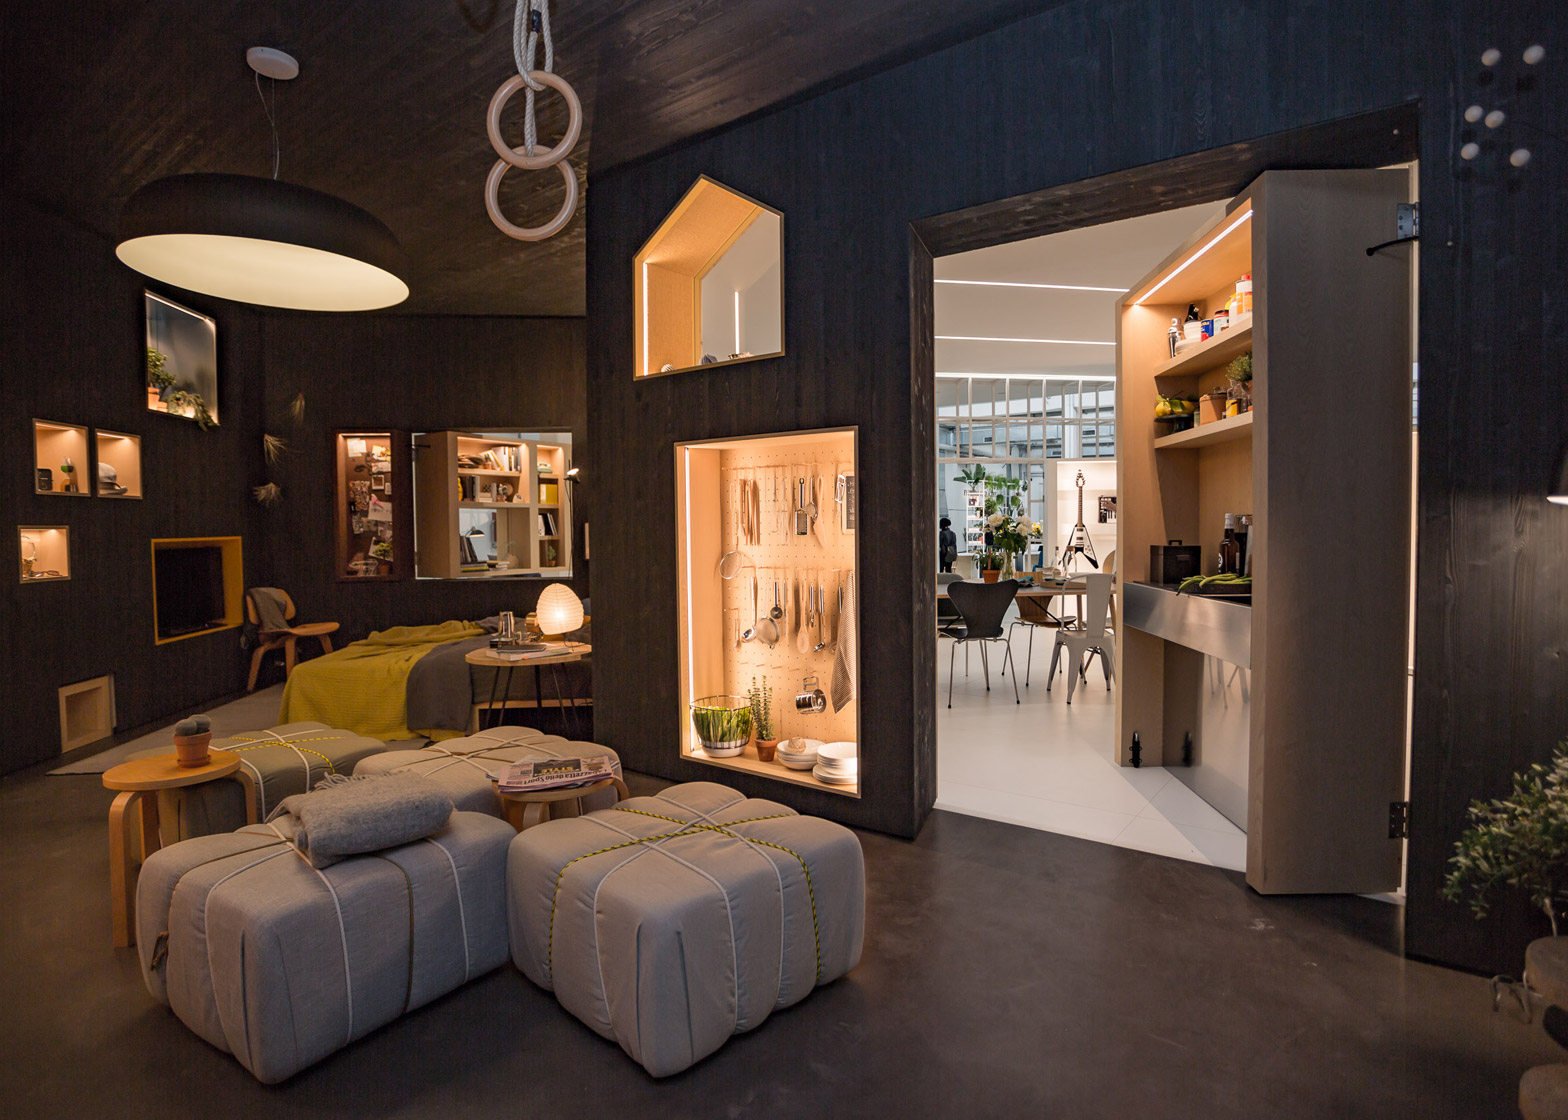 mini-living-installation-milan-design-week-2016_dezeen_1568_1-1